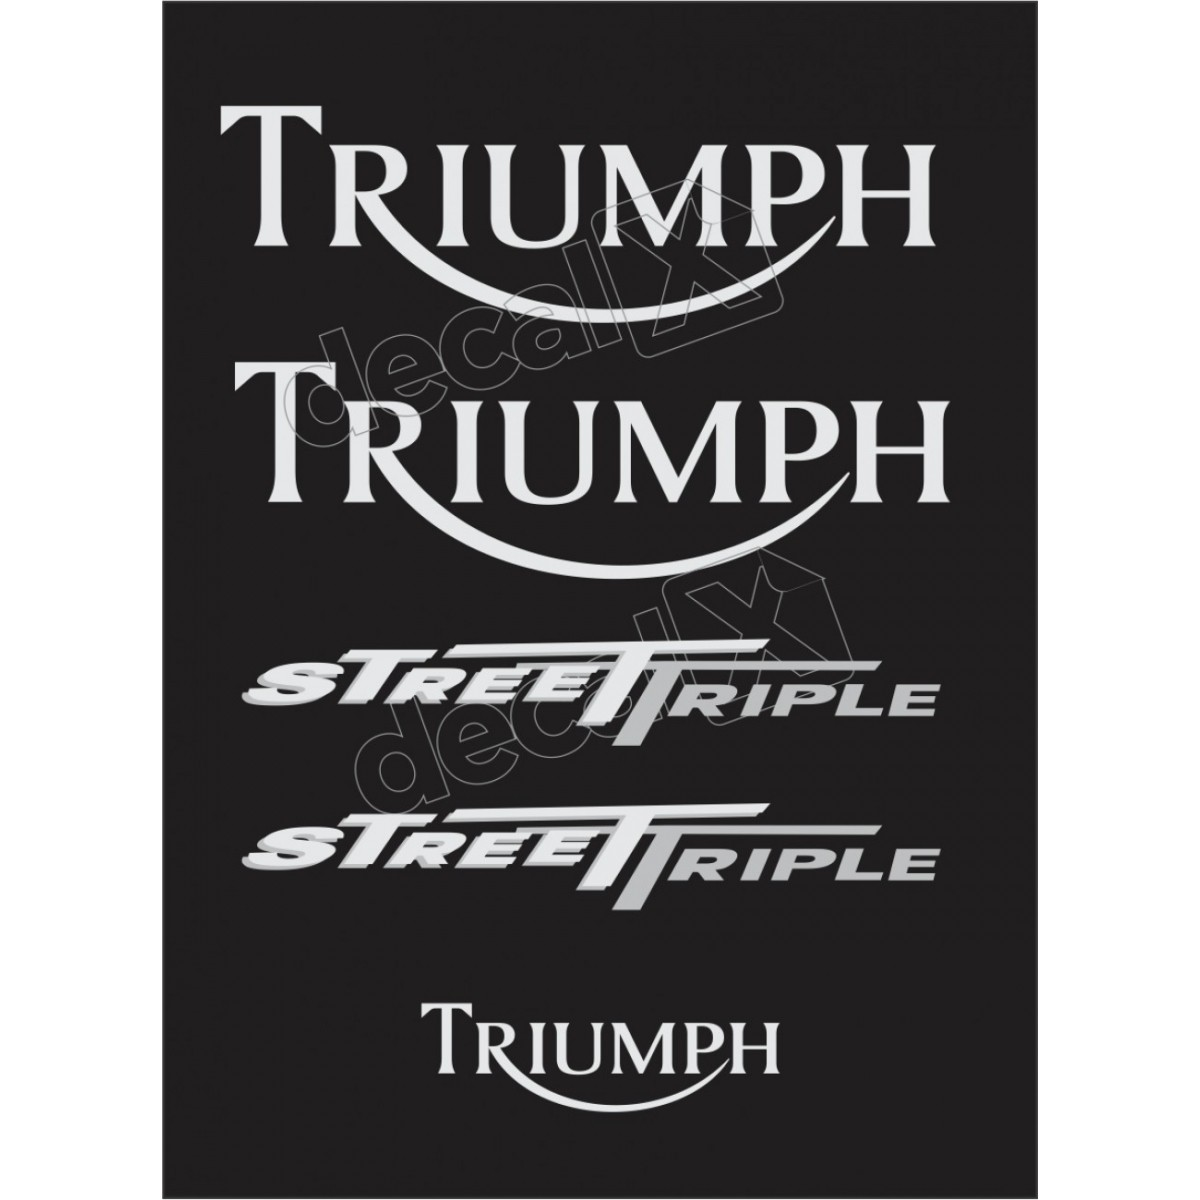 Kit Adesivos Triumph 675 Street Triple Preta Decalx